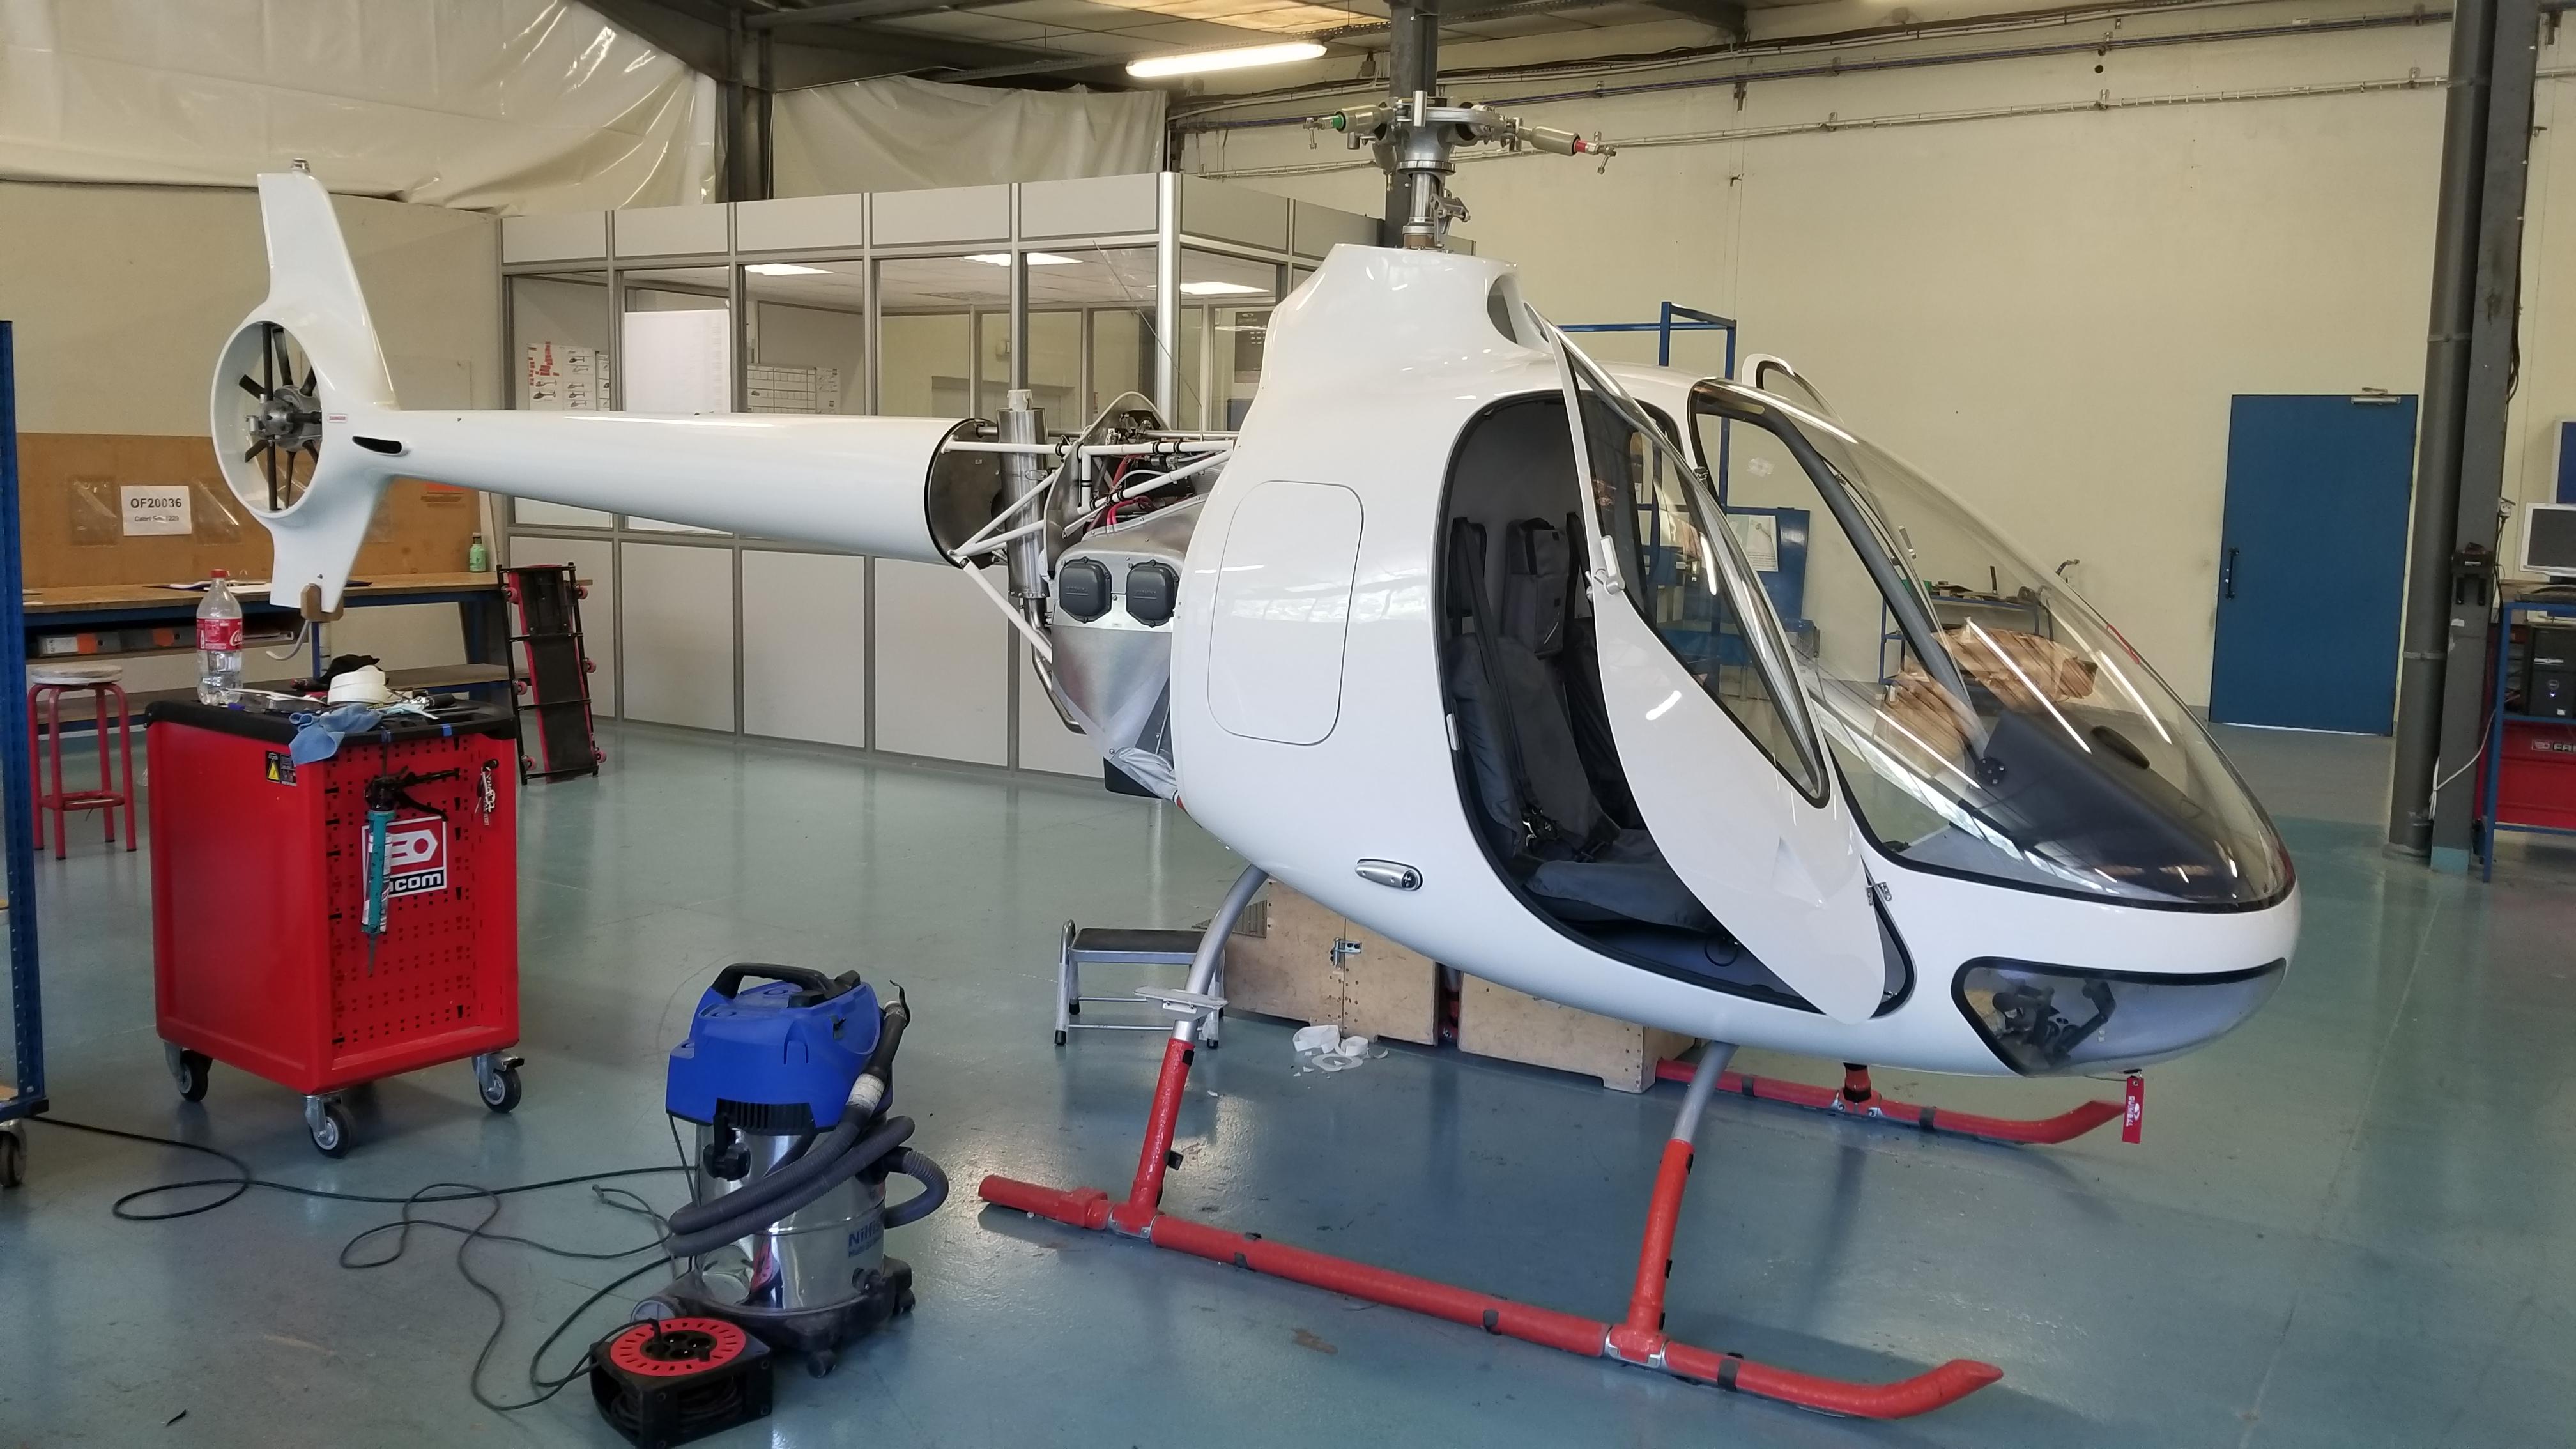 Construction Aix En Provence guimbal cabri g2 engine installation - vertical flight photo